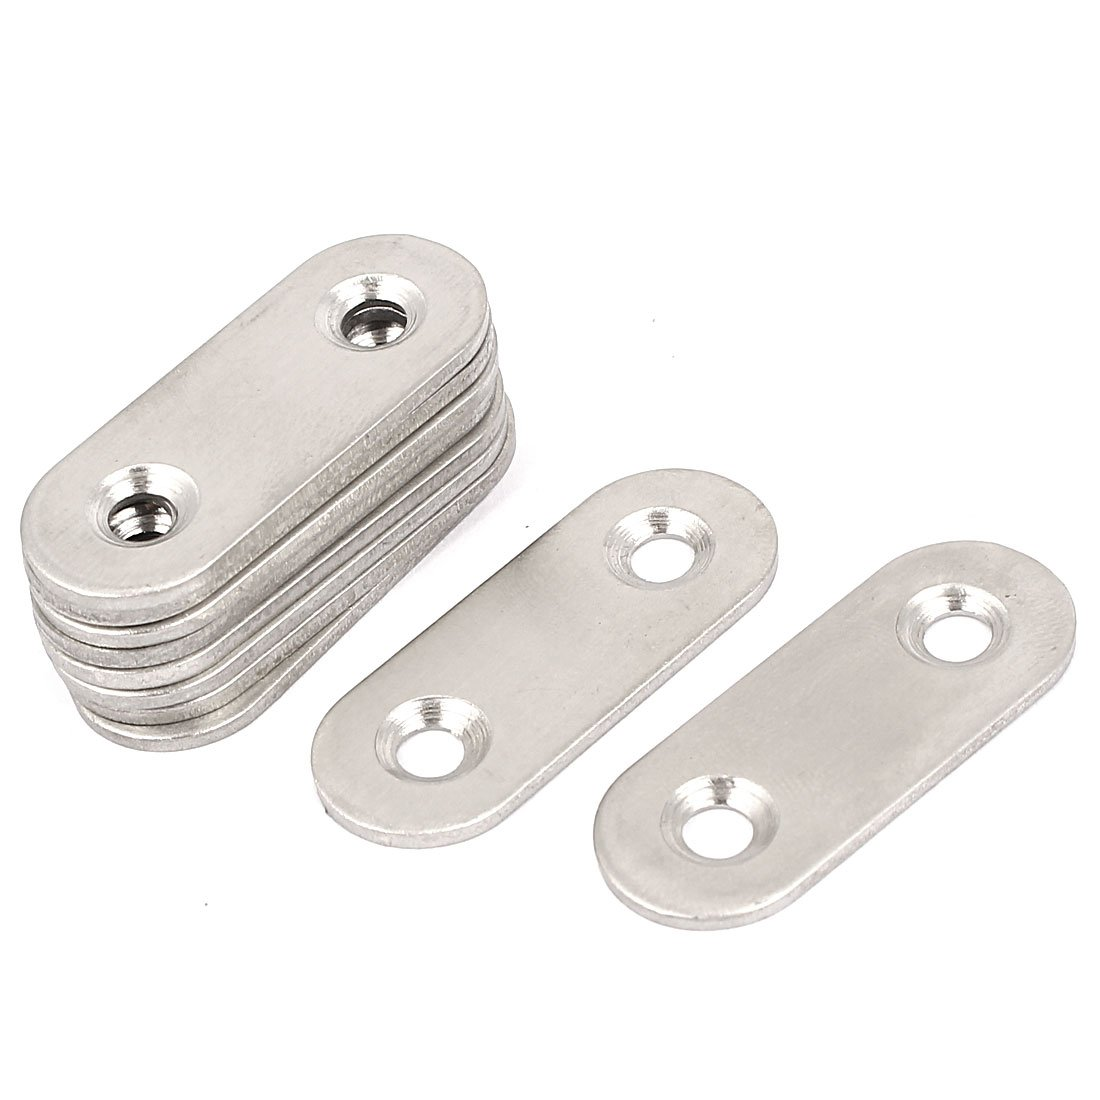 uxcell Flat Mending Plates Repair Fixing Joining Brackets 40x15mm 10pcs a16020200ux0536